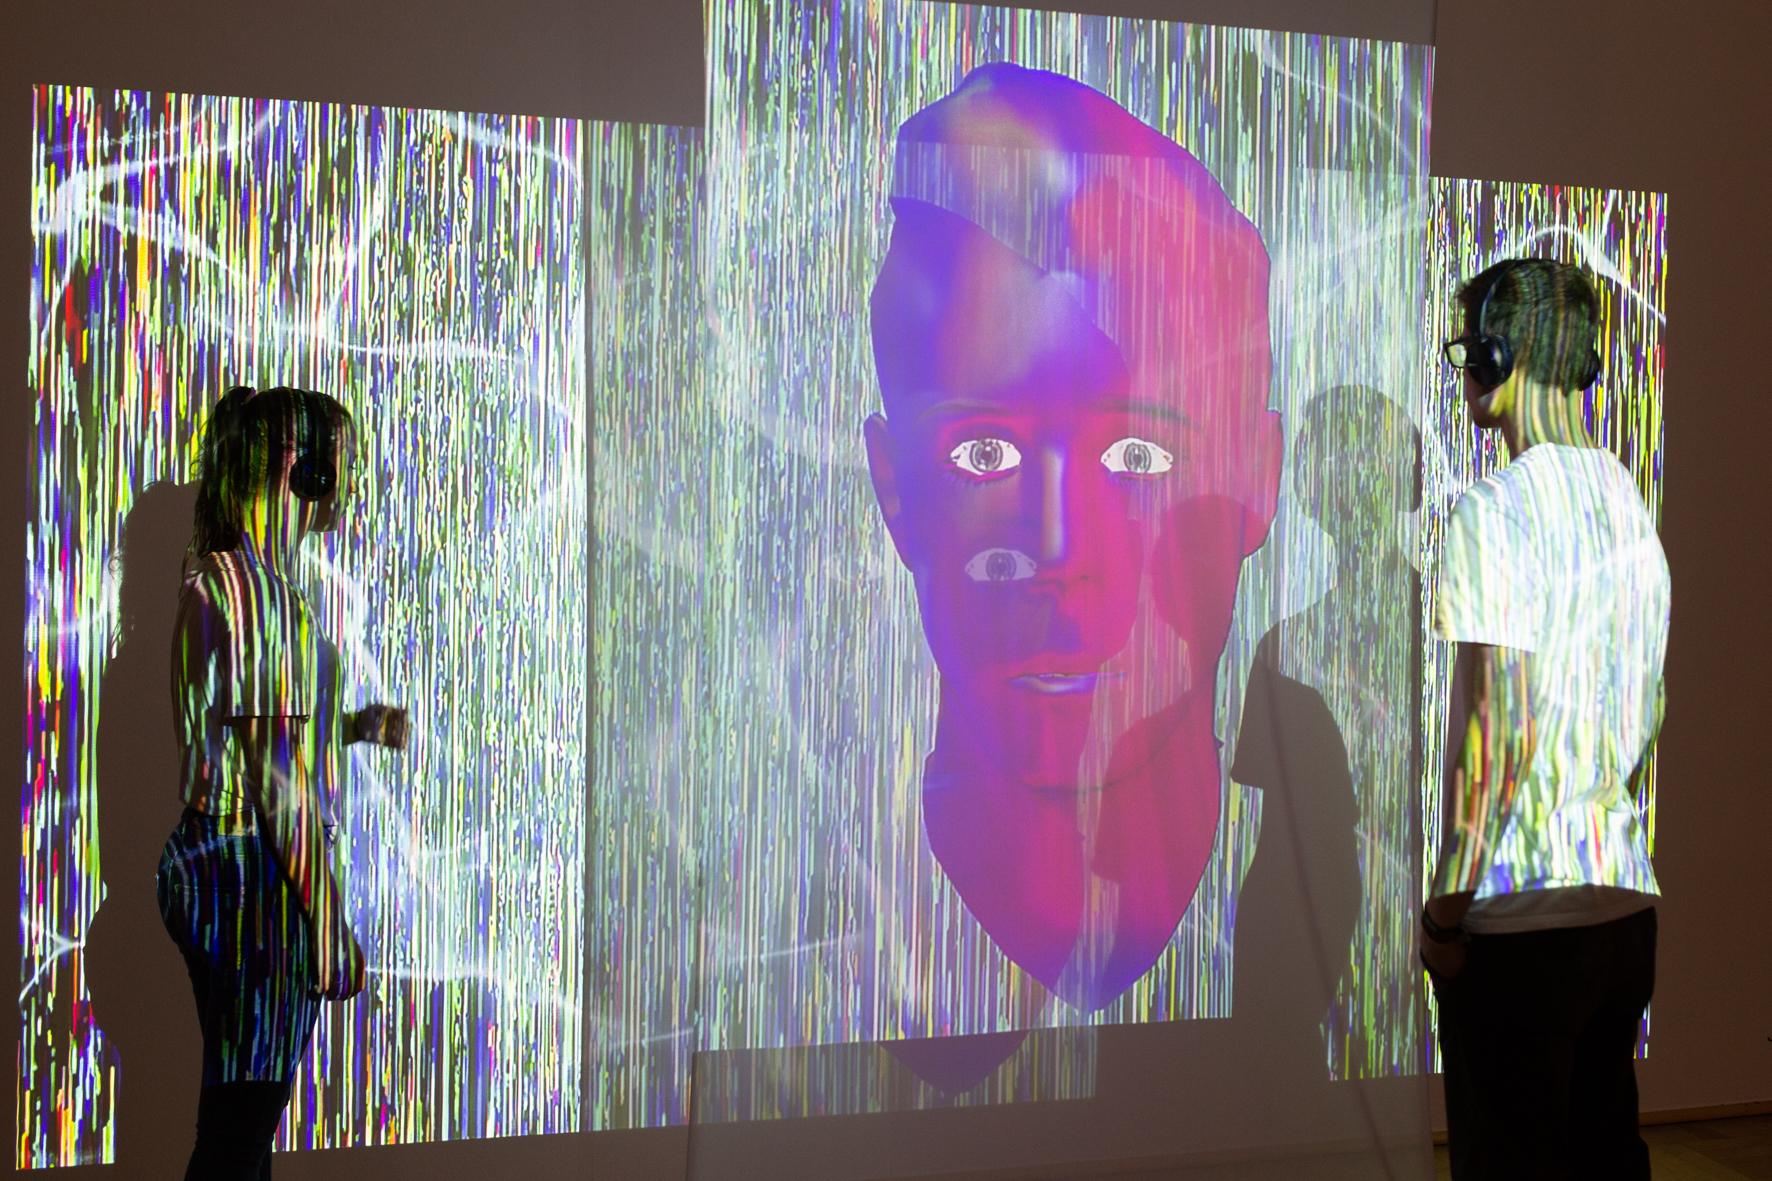 Exhibition view: PENDORAN VINCI, installation by Jonas Blume, photo © NRW-Forum Düsseldorf / Bozica Babic